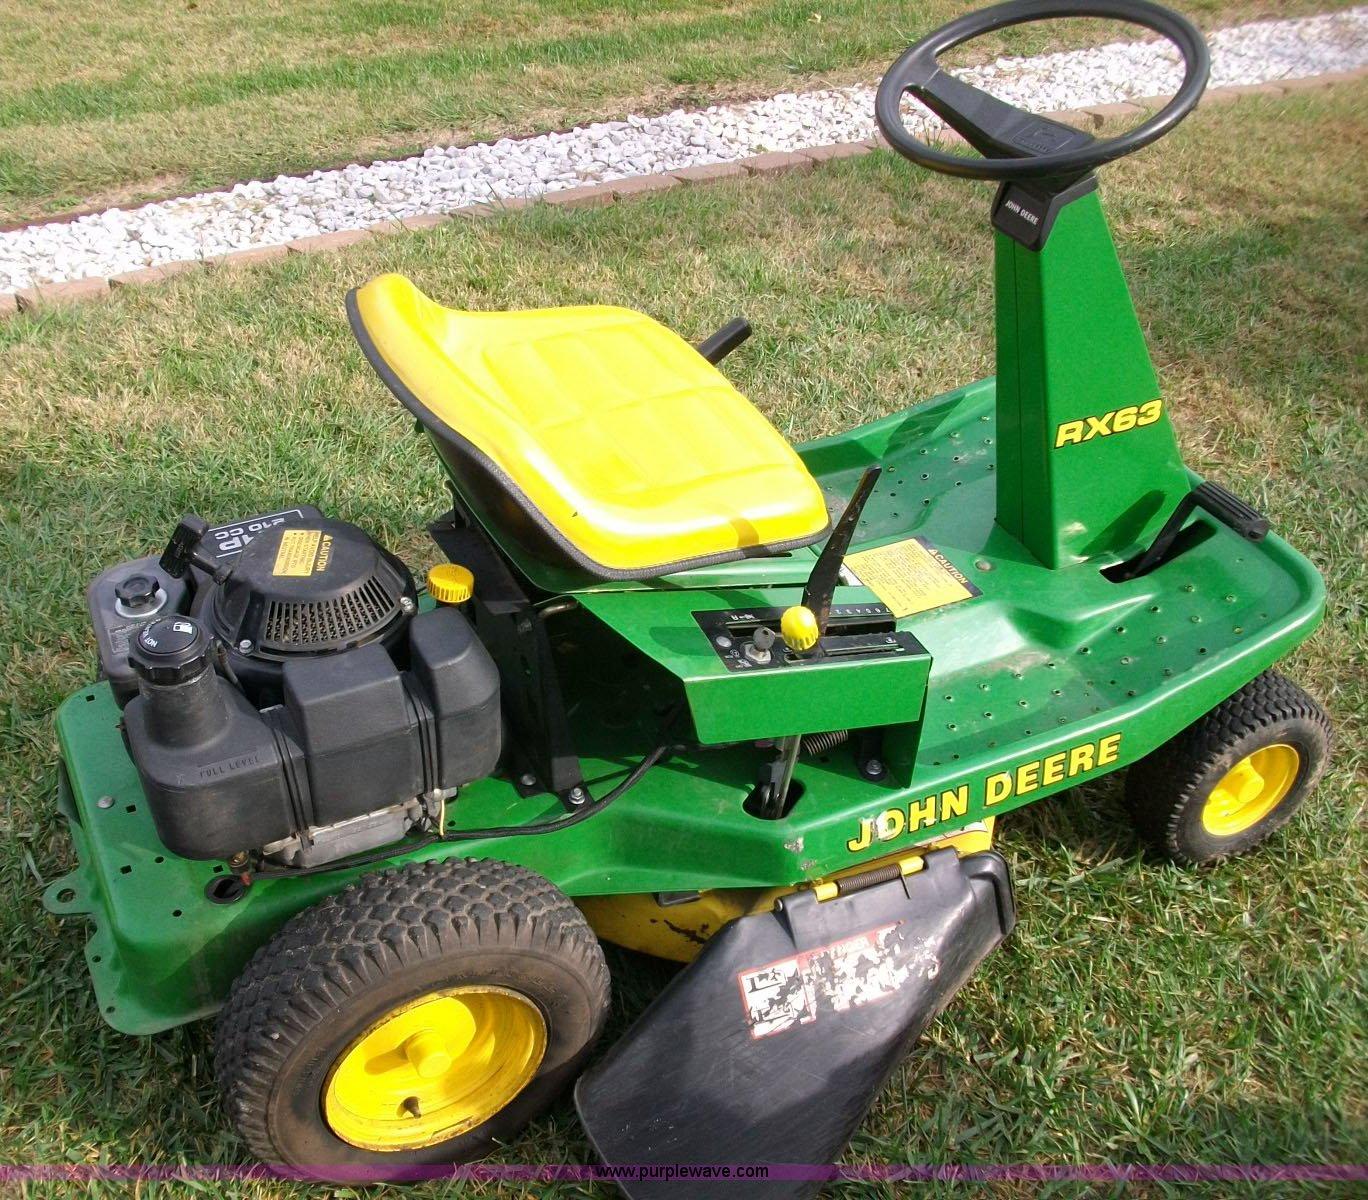 John deere rx63 lawn mower item 1807 sold november 3 for Lawn tractor motors for sale